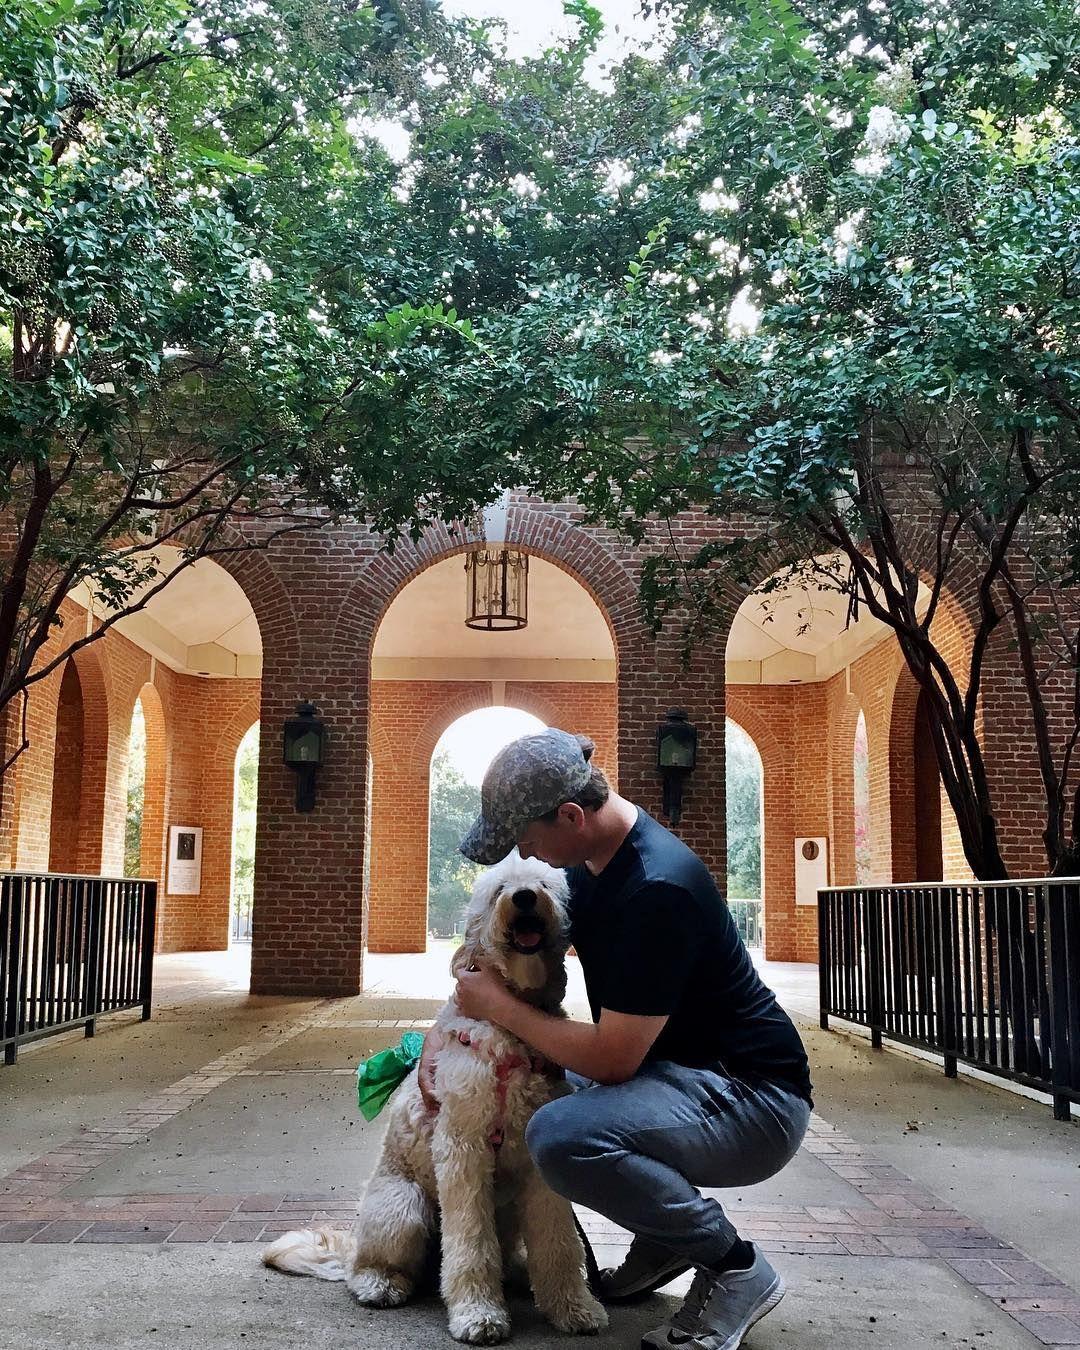 Walks On The Baylor Campus Goldendoodle At Baylor University Goldendoodle Baylor Campus Dogs